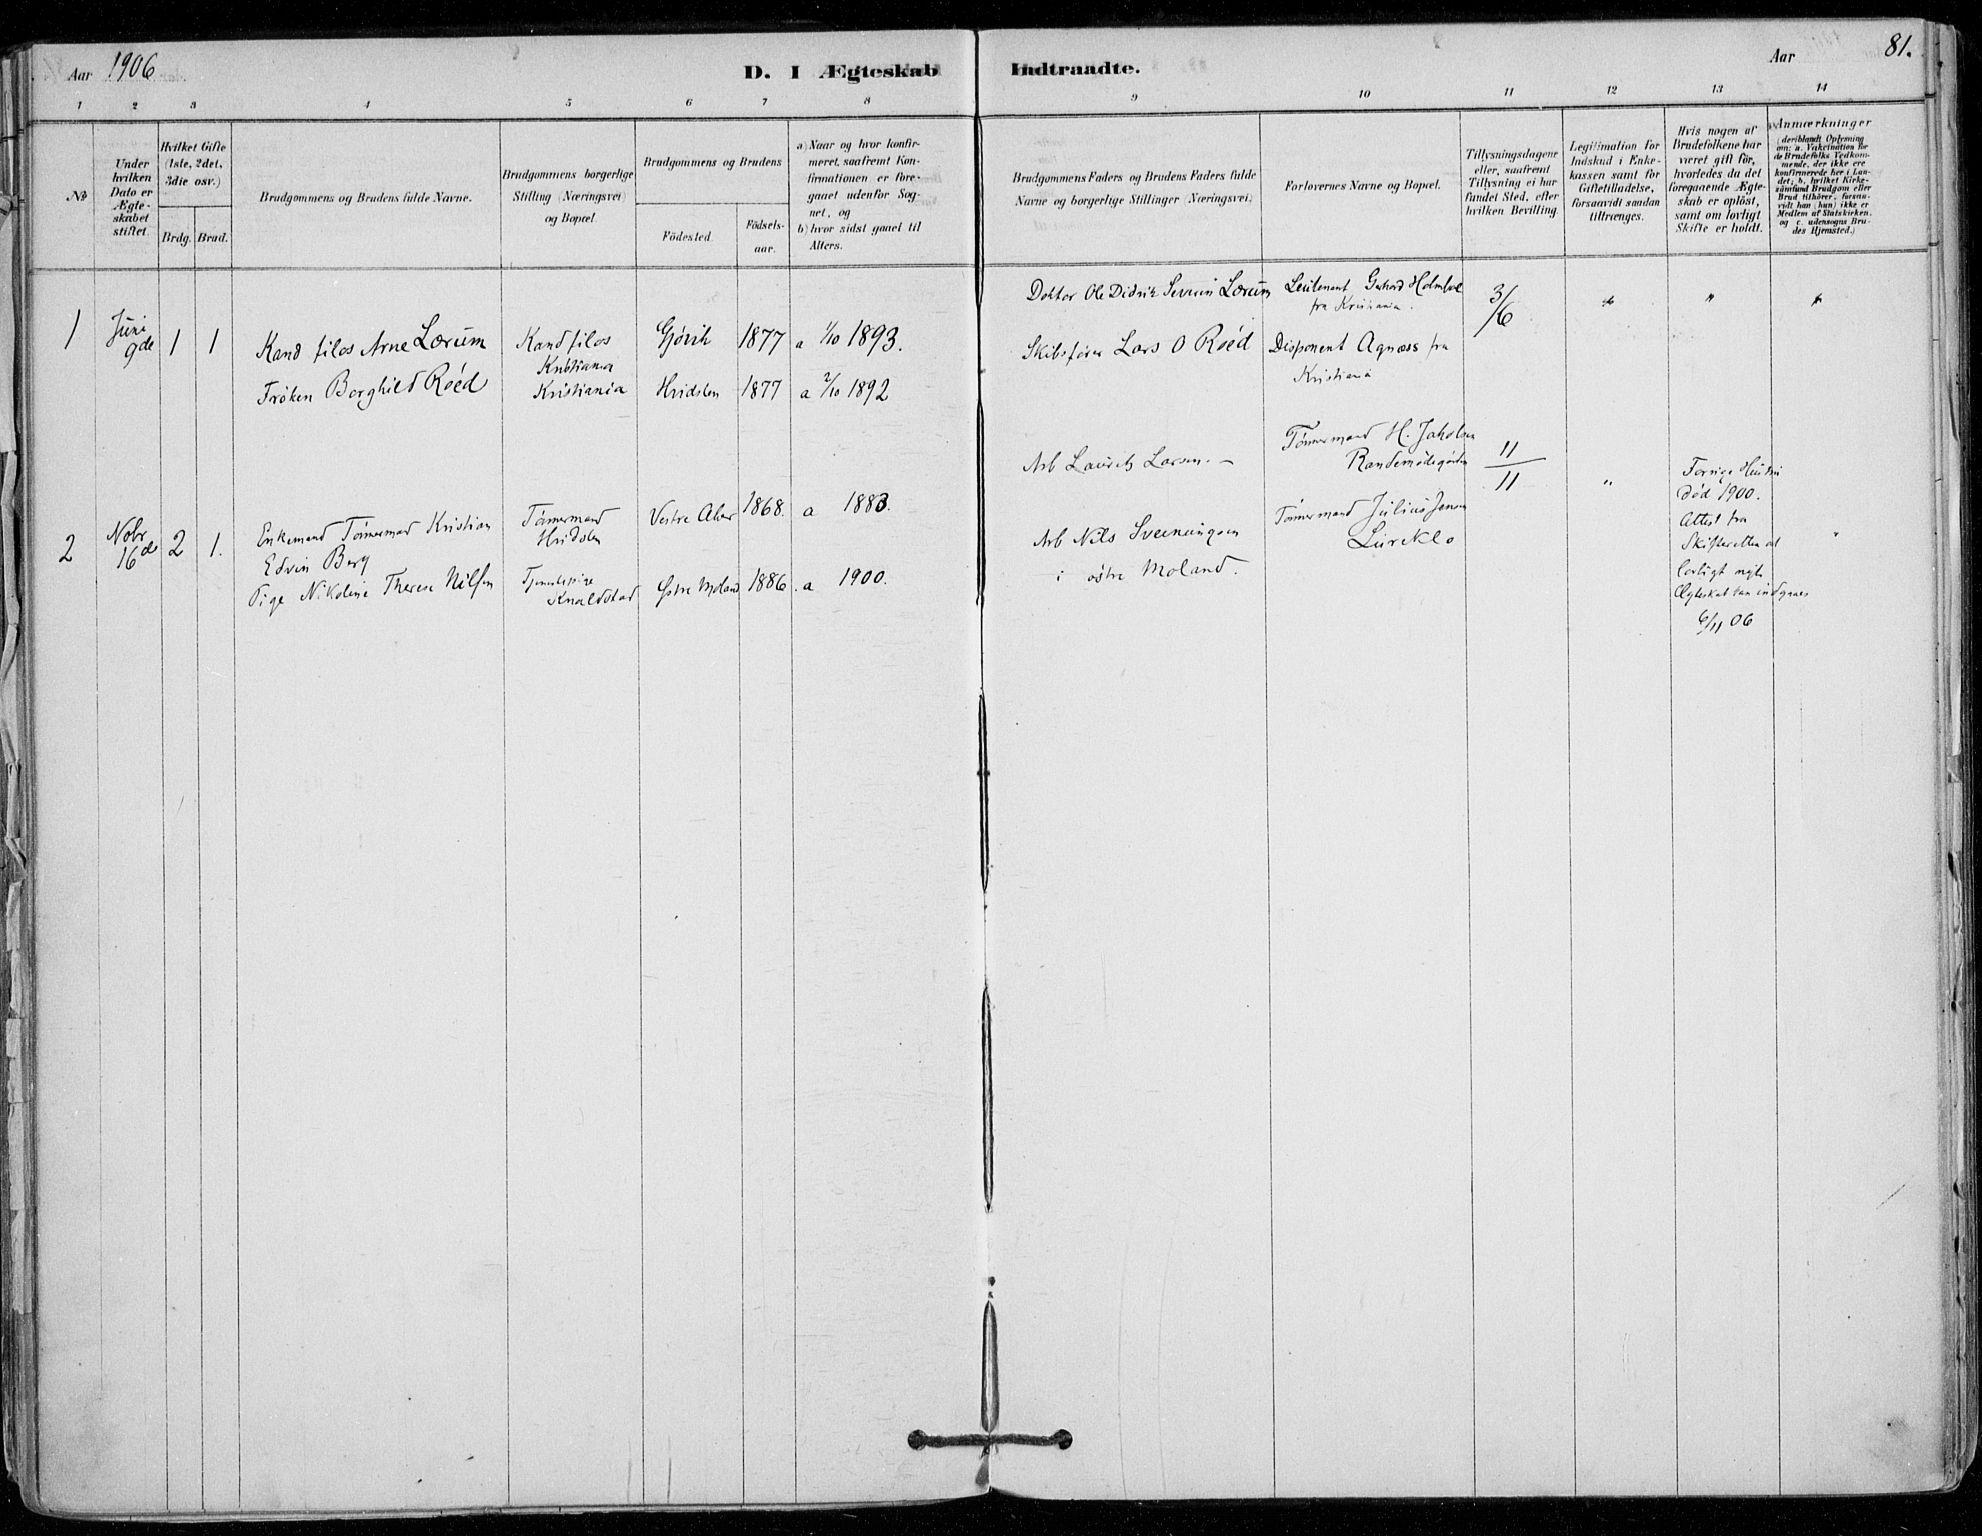 SAO, Vestby prestekontor Kirkebøker, F/Fd/L0001: Ministerialbok nr. IV 1, 1878-1945, s. 81